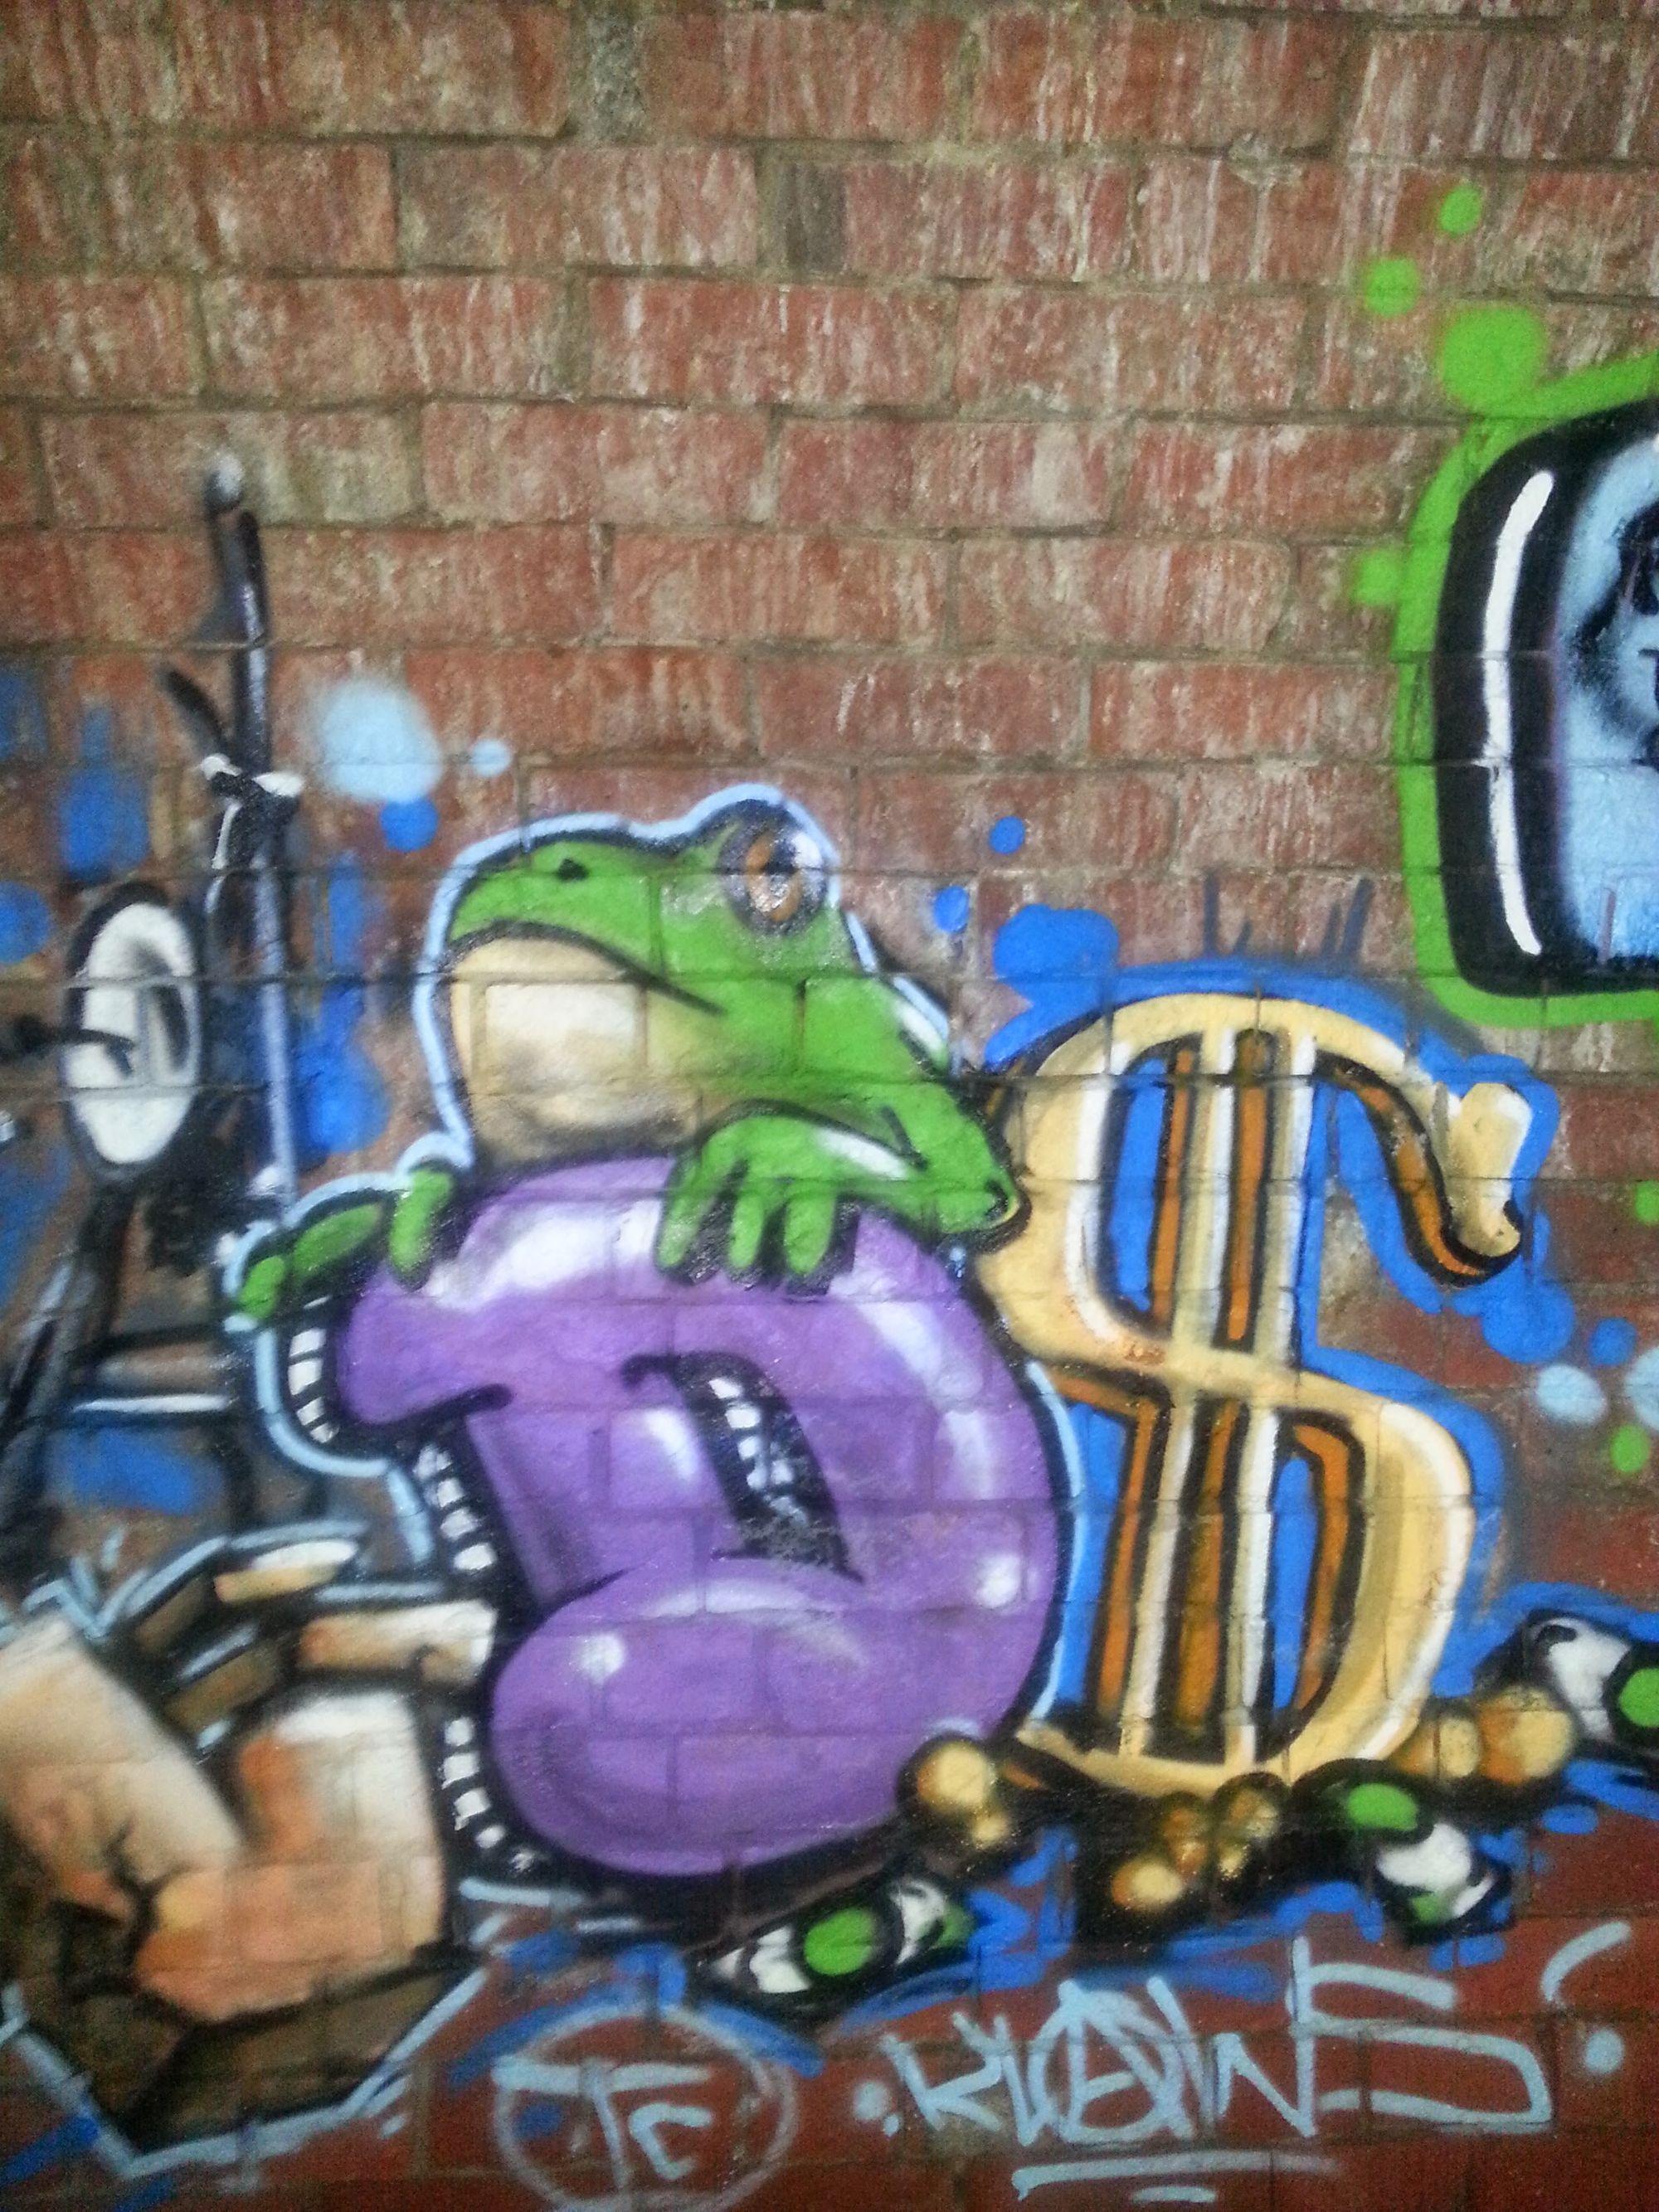 townsville stormwater drain frog graffiti